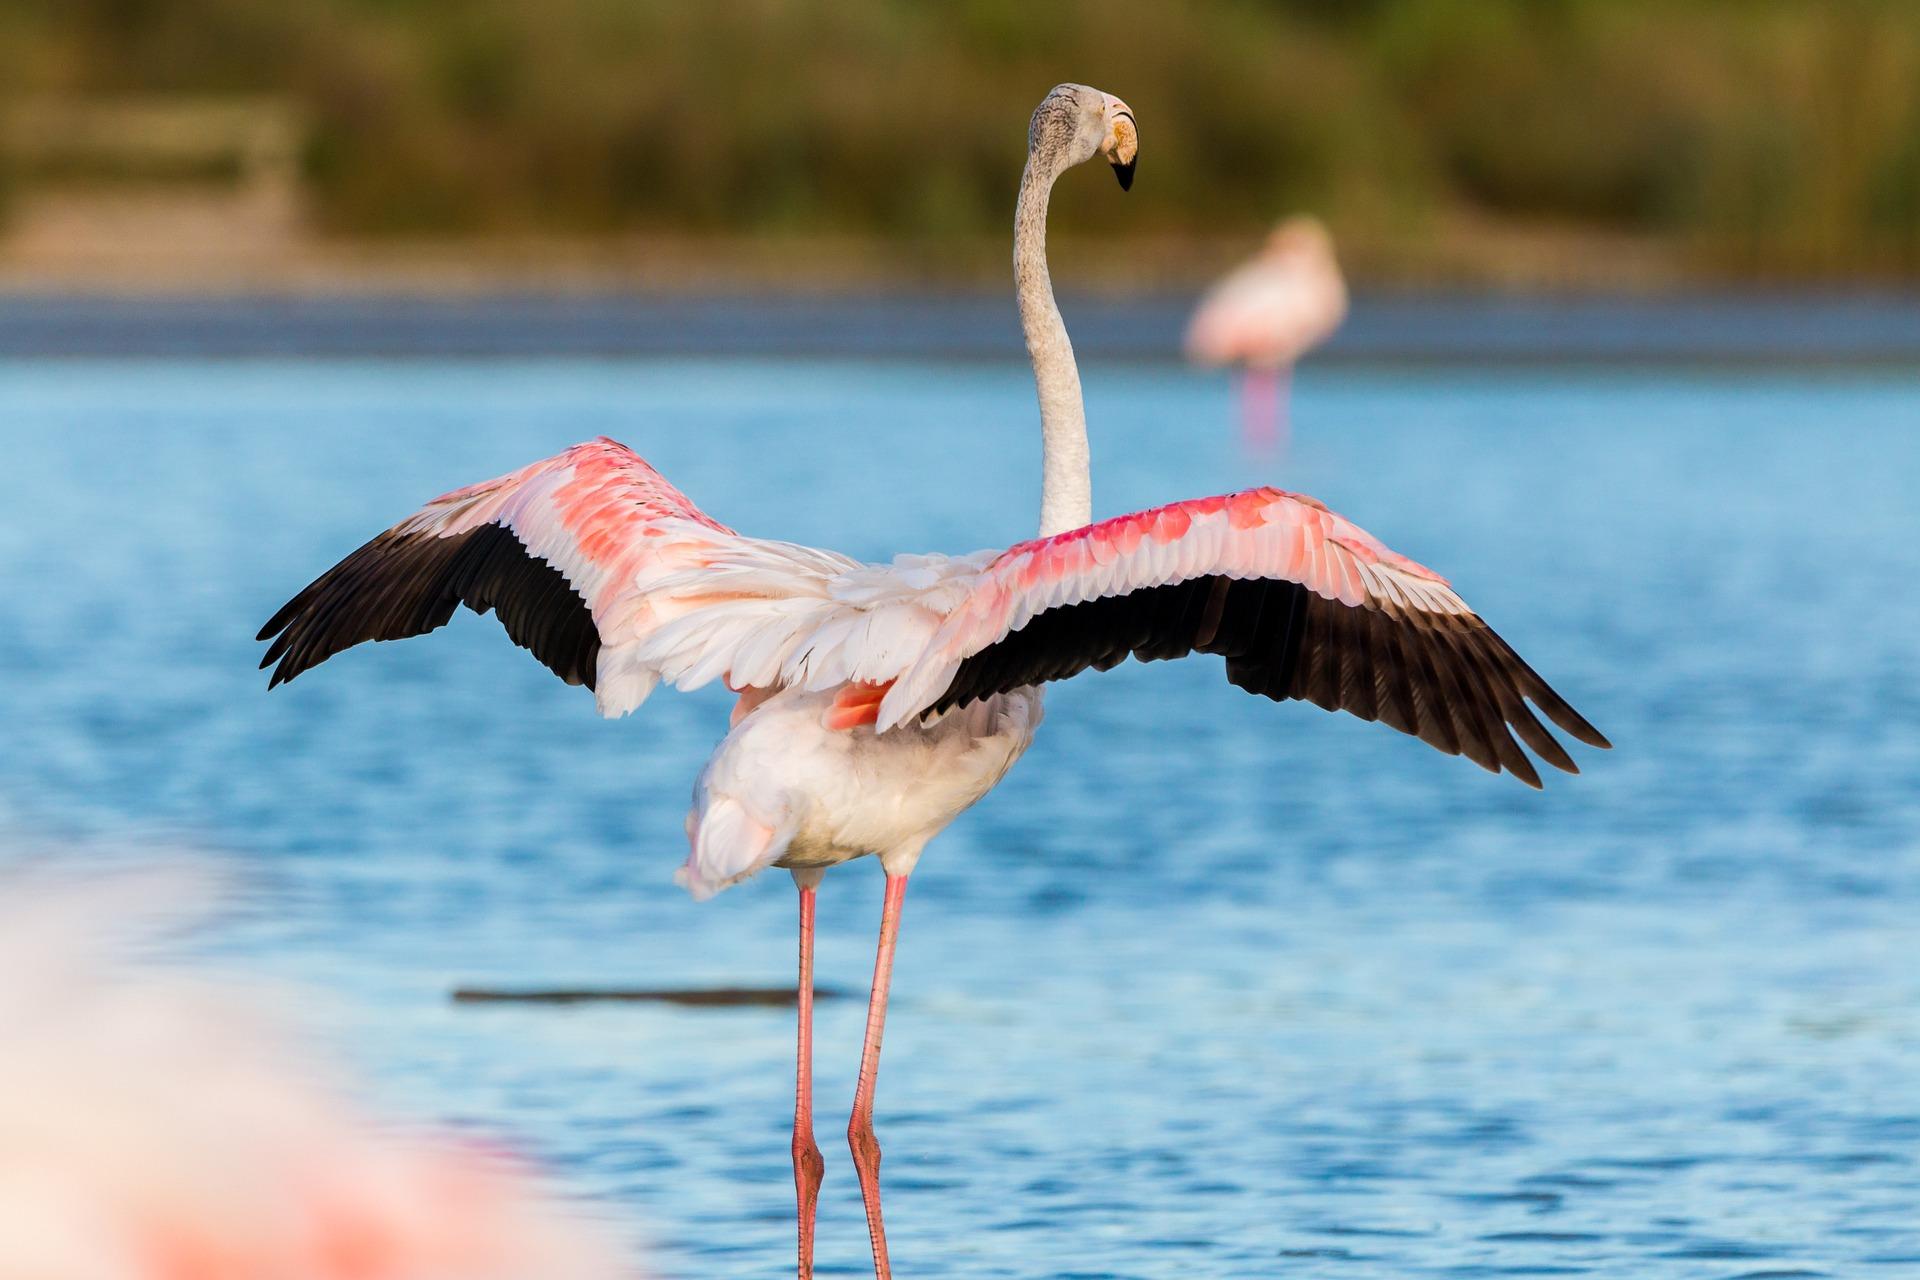 Einzug der Flamingos auf Ibiza #unesco #weltkulturerbe #salinas #flamingo #ibiza #spanien #balearen #urlaubstipps #wandern